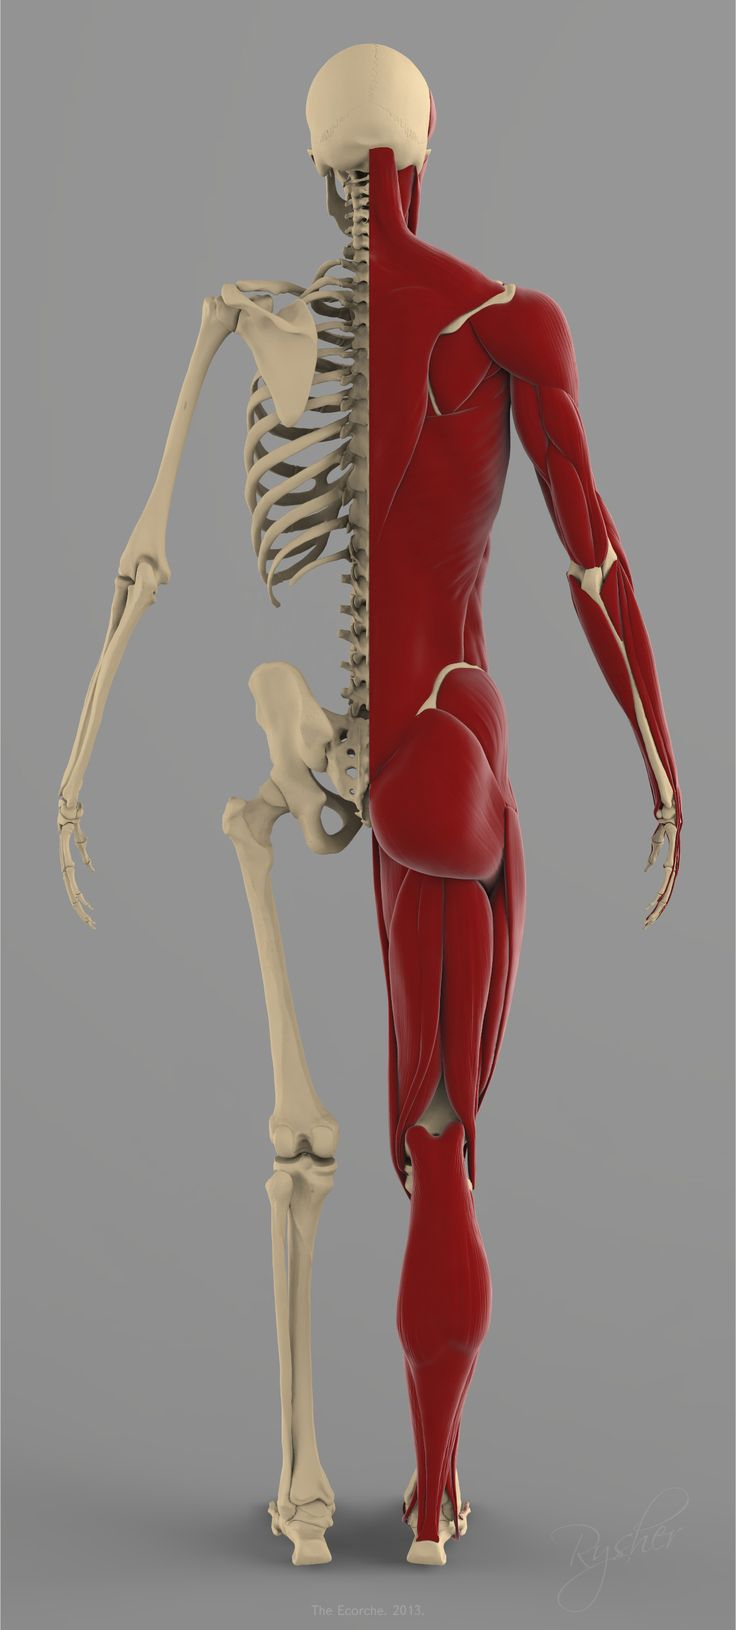 39 best HUMAN SKELETON images on Pinterest | Bones, Tattoo ...